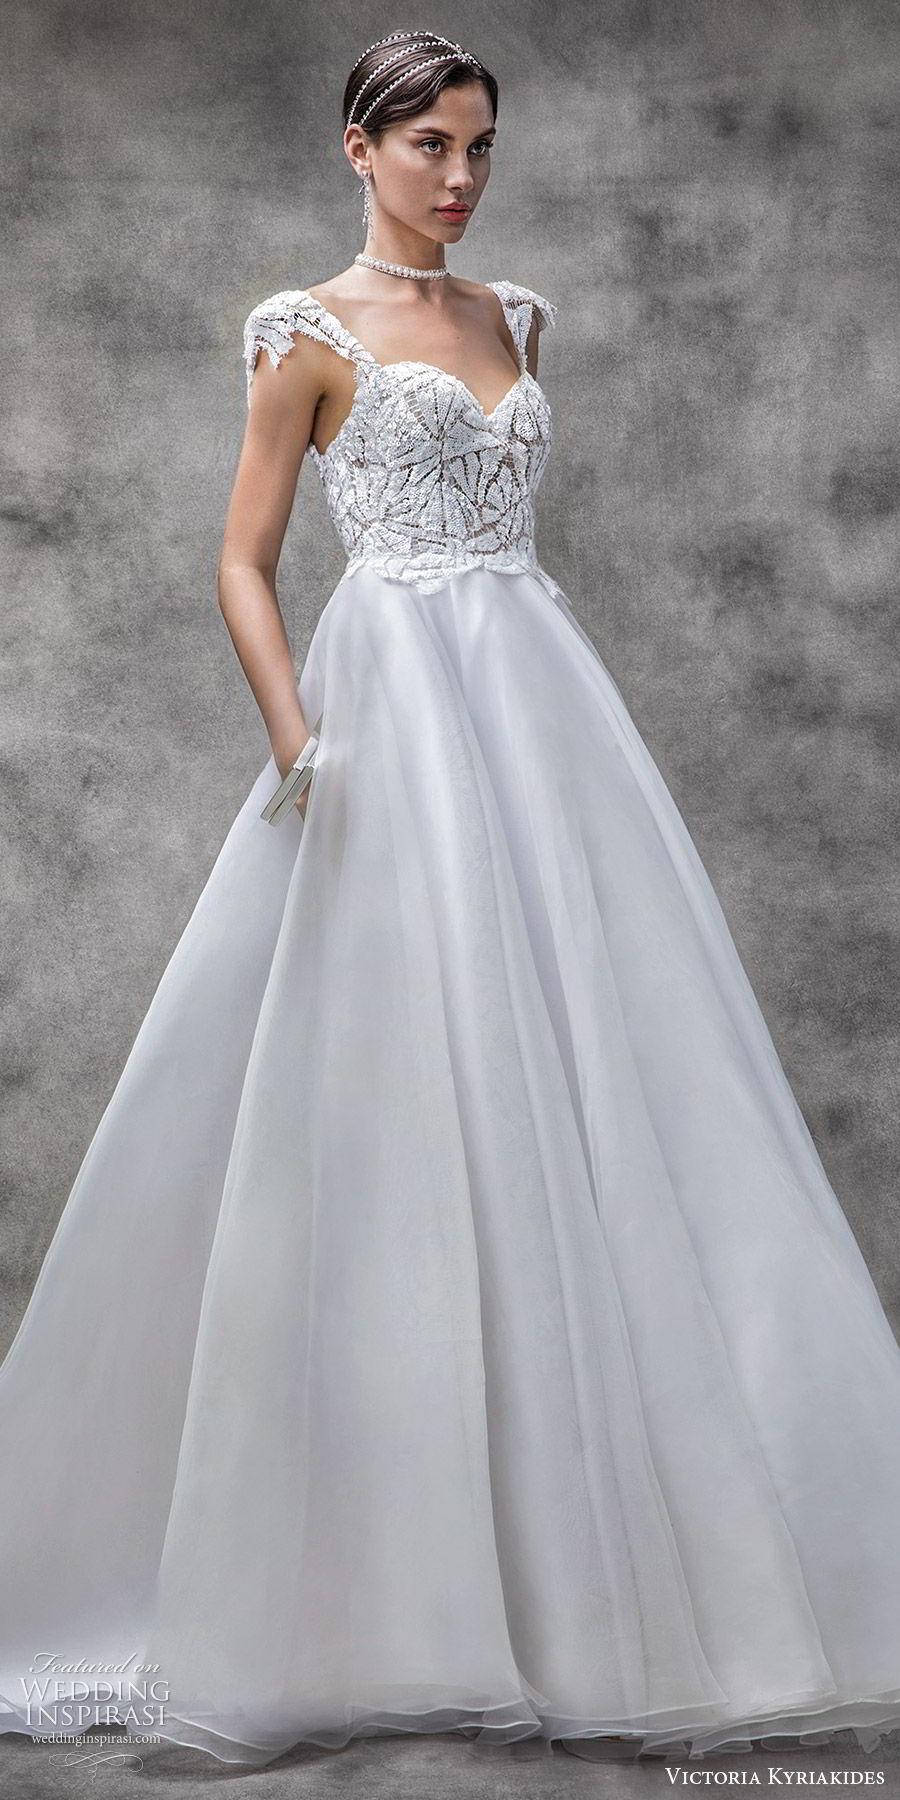 victoria kyriakides spring 2020 bridal cap sleeves sweetheart embellished bodice a line ball gown wedding dress (16) elegant romantic modern mv